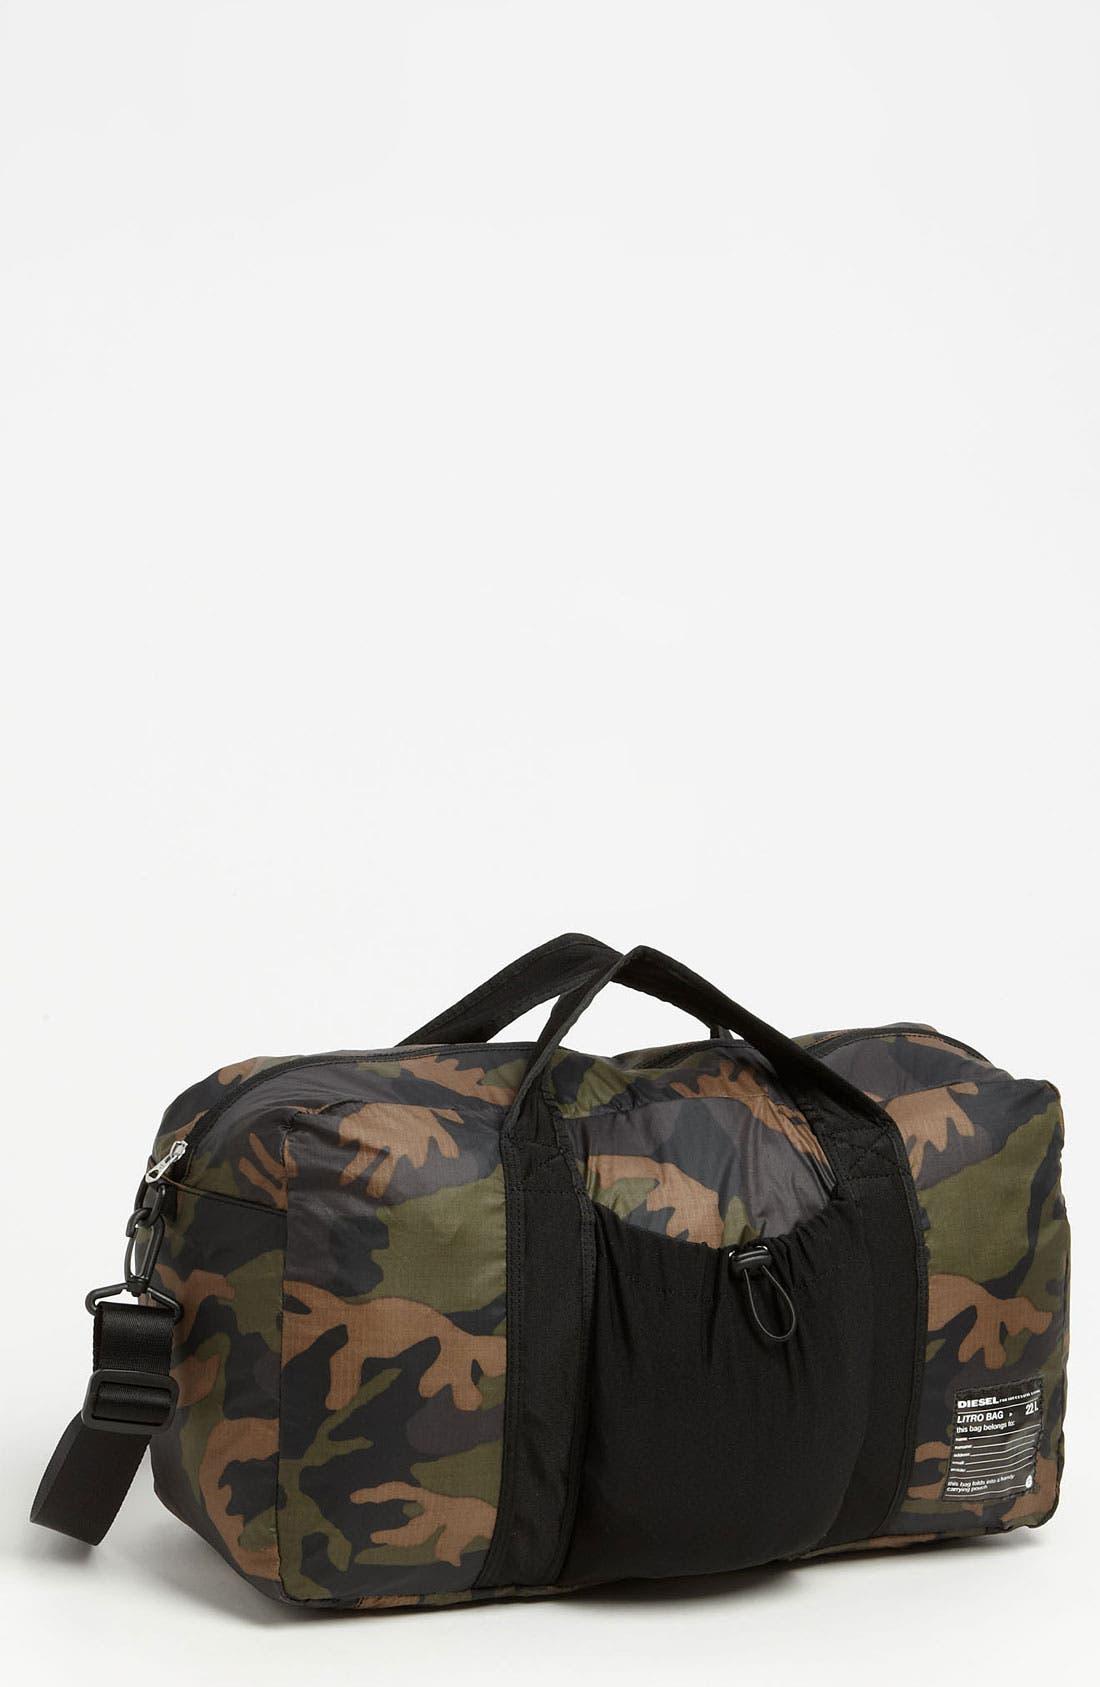 Alternate Image 1 Selected - DIESEL® 'Litro' Duffle Bag